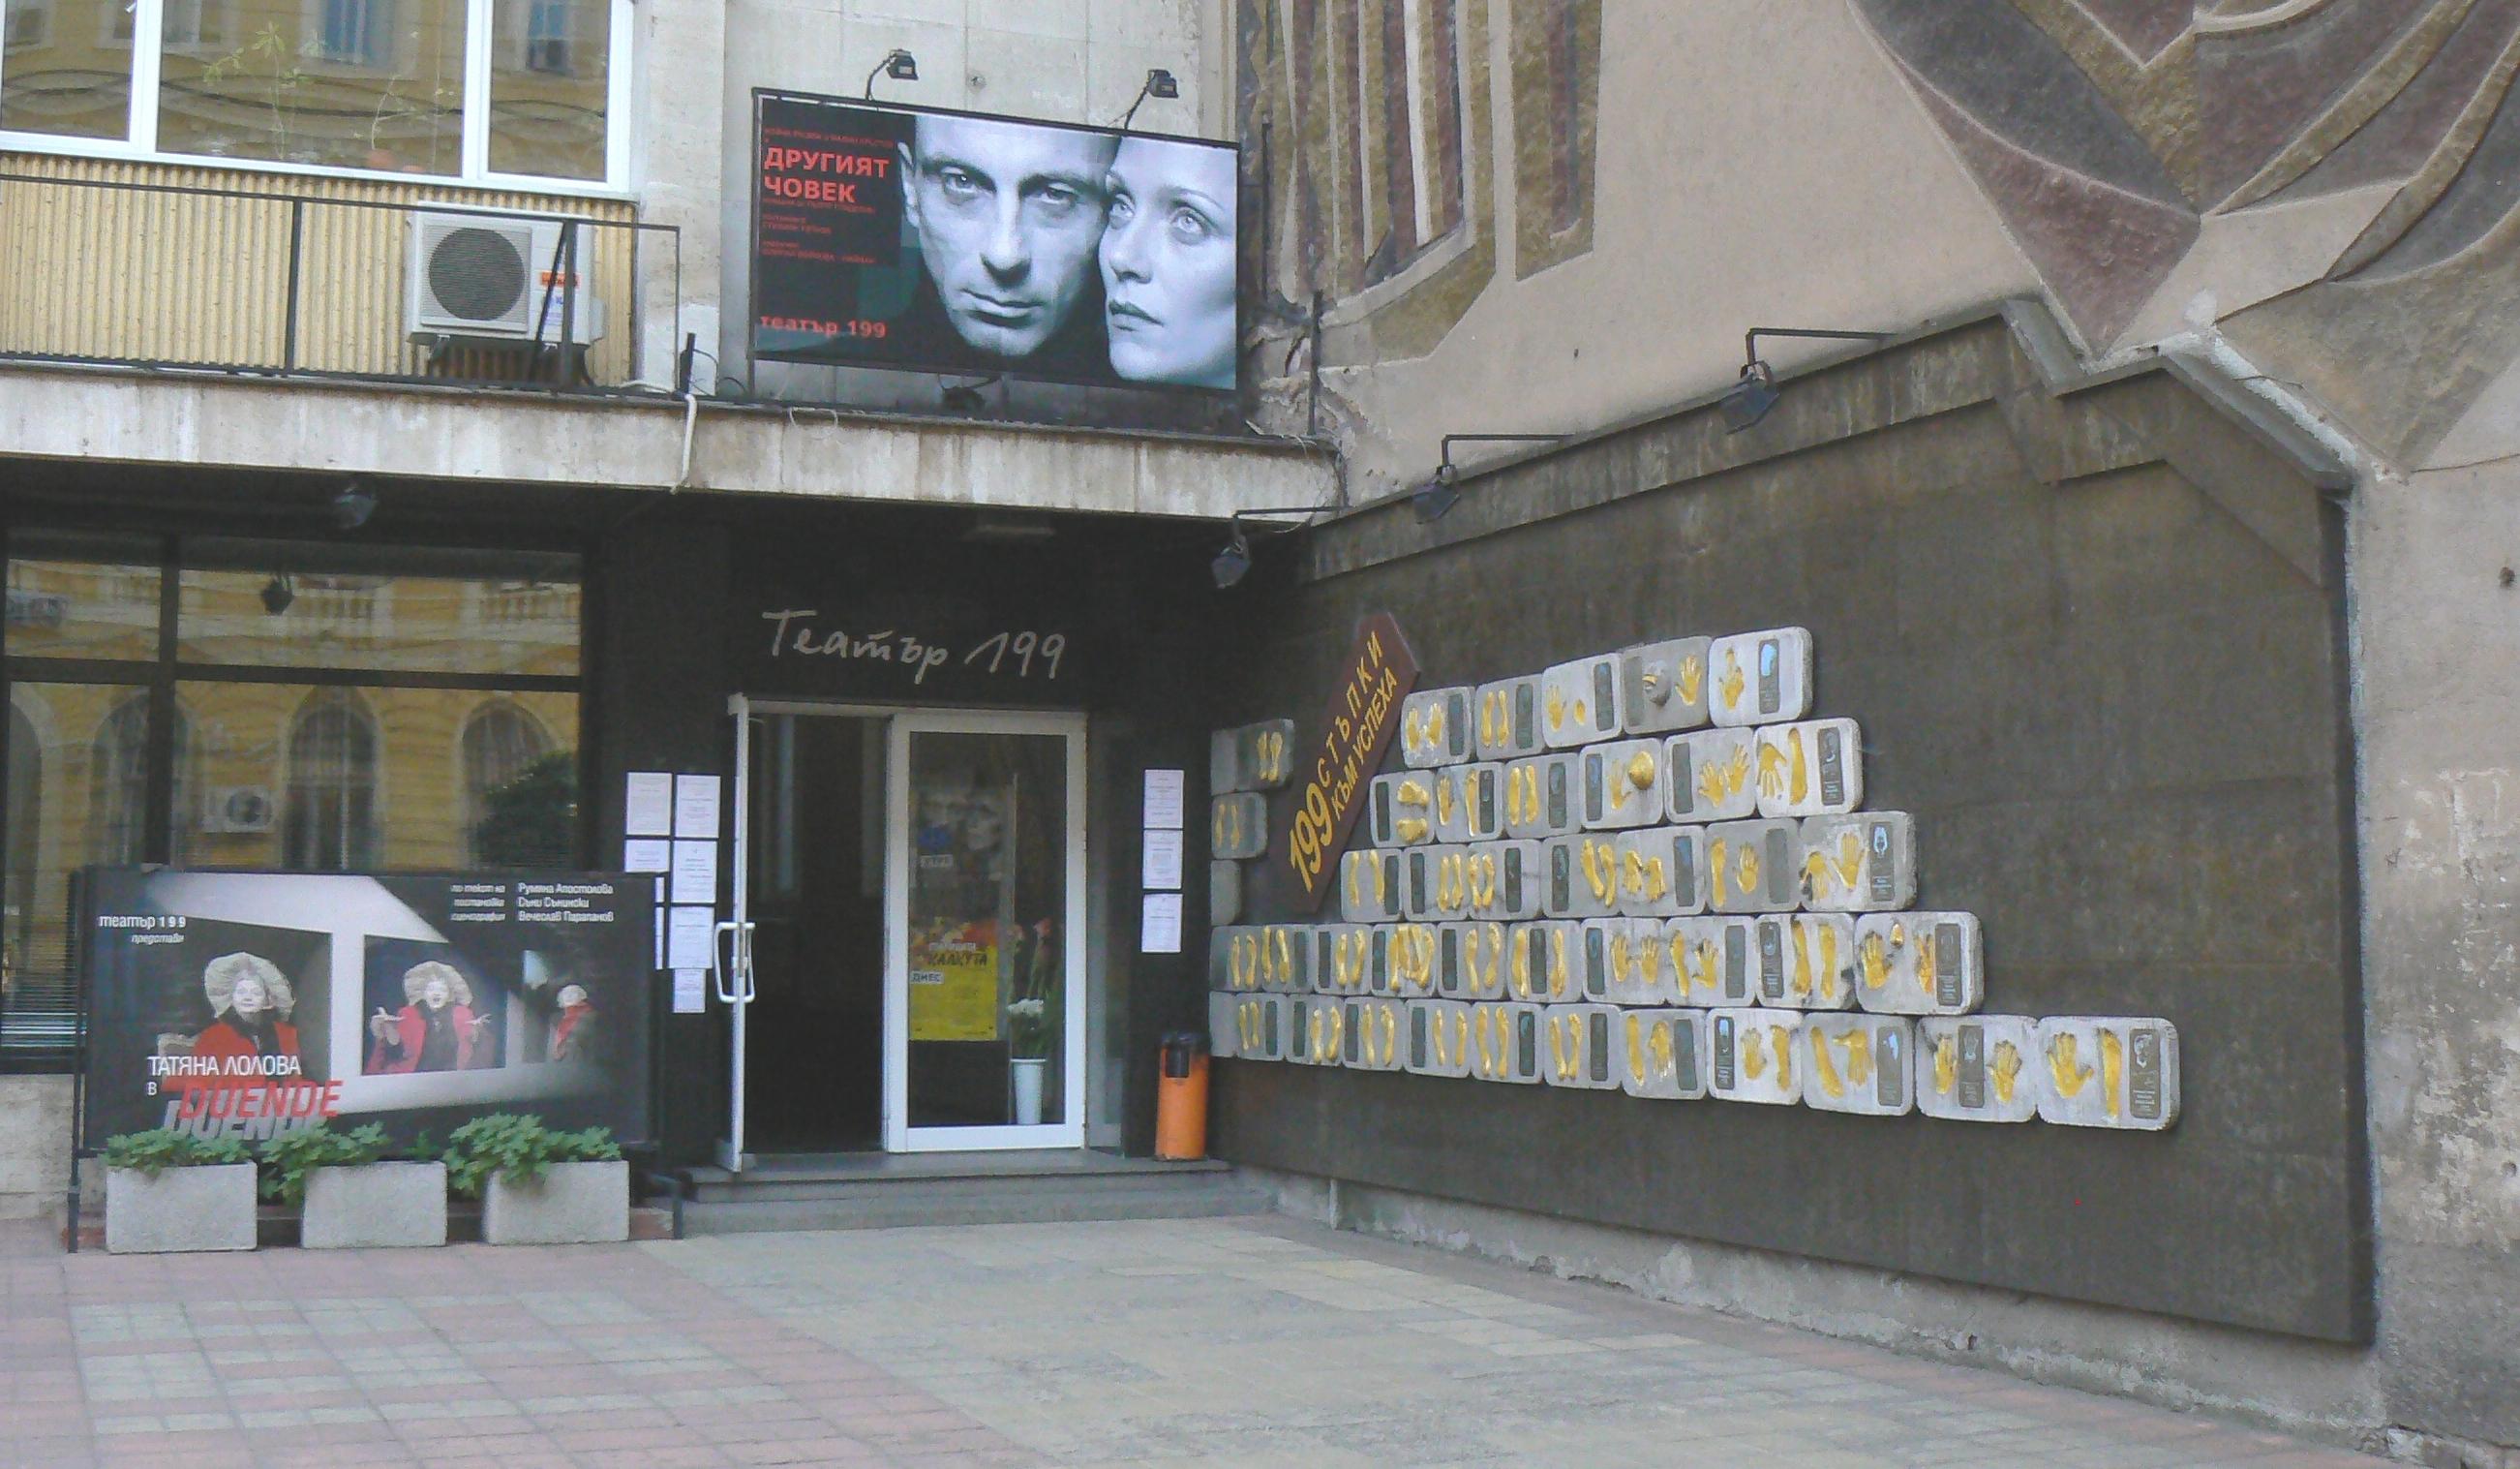 https://upload.wikimedia.org/wikipedia/commons/b/b0/Sofia-Theater199.JPG